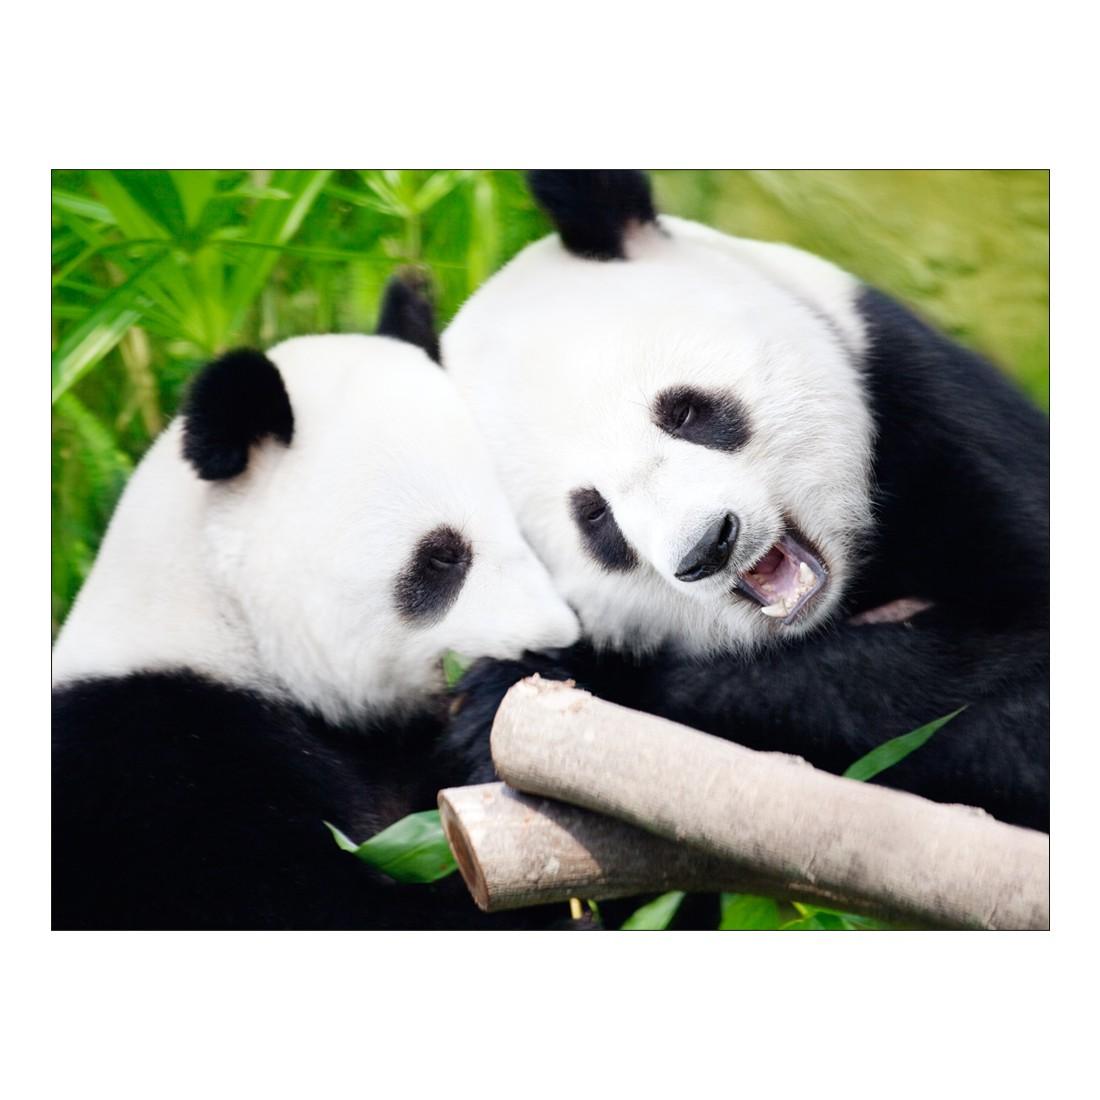 Leinwandbild Pandas – 100 x 75cm, Gallery of Innovative Art kaufen